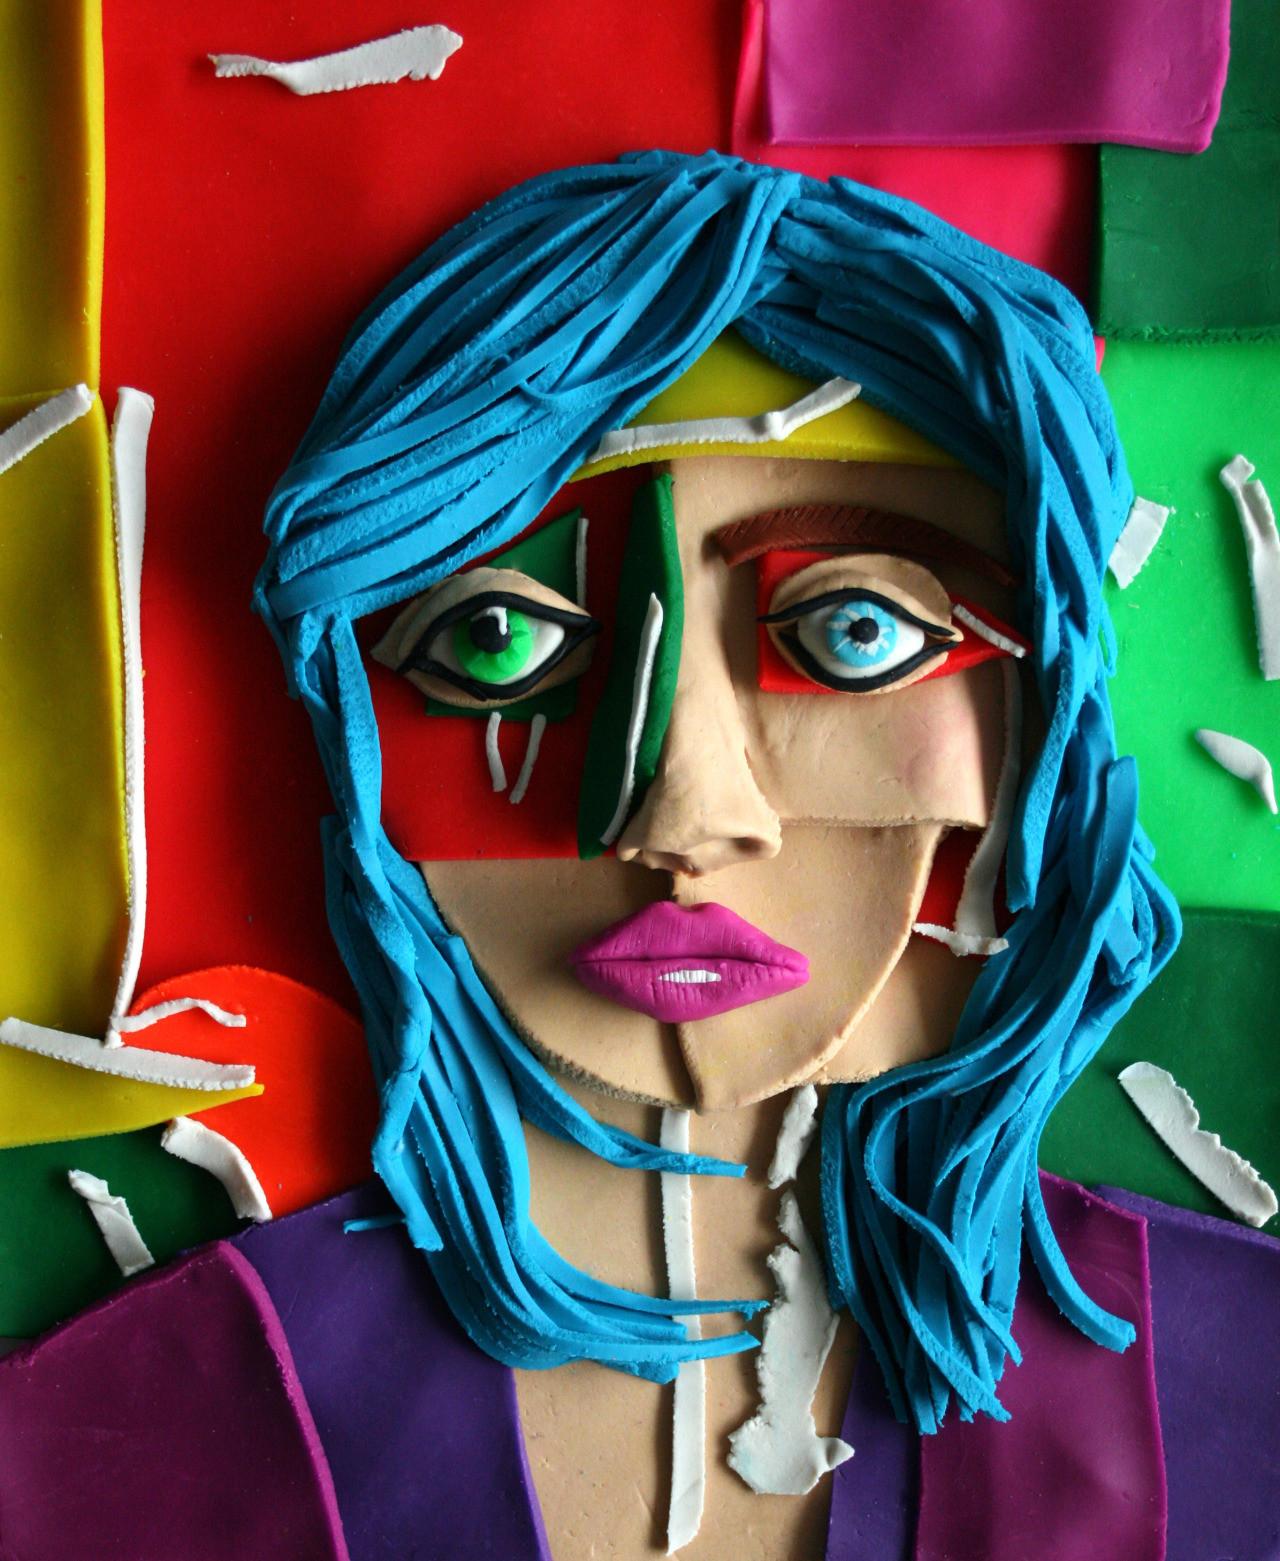 Photographs Rendered in Play–Doh: Eleanor Macnair